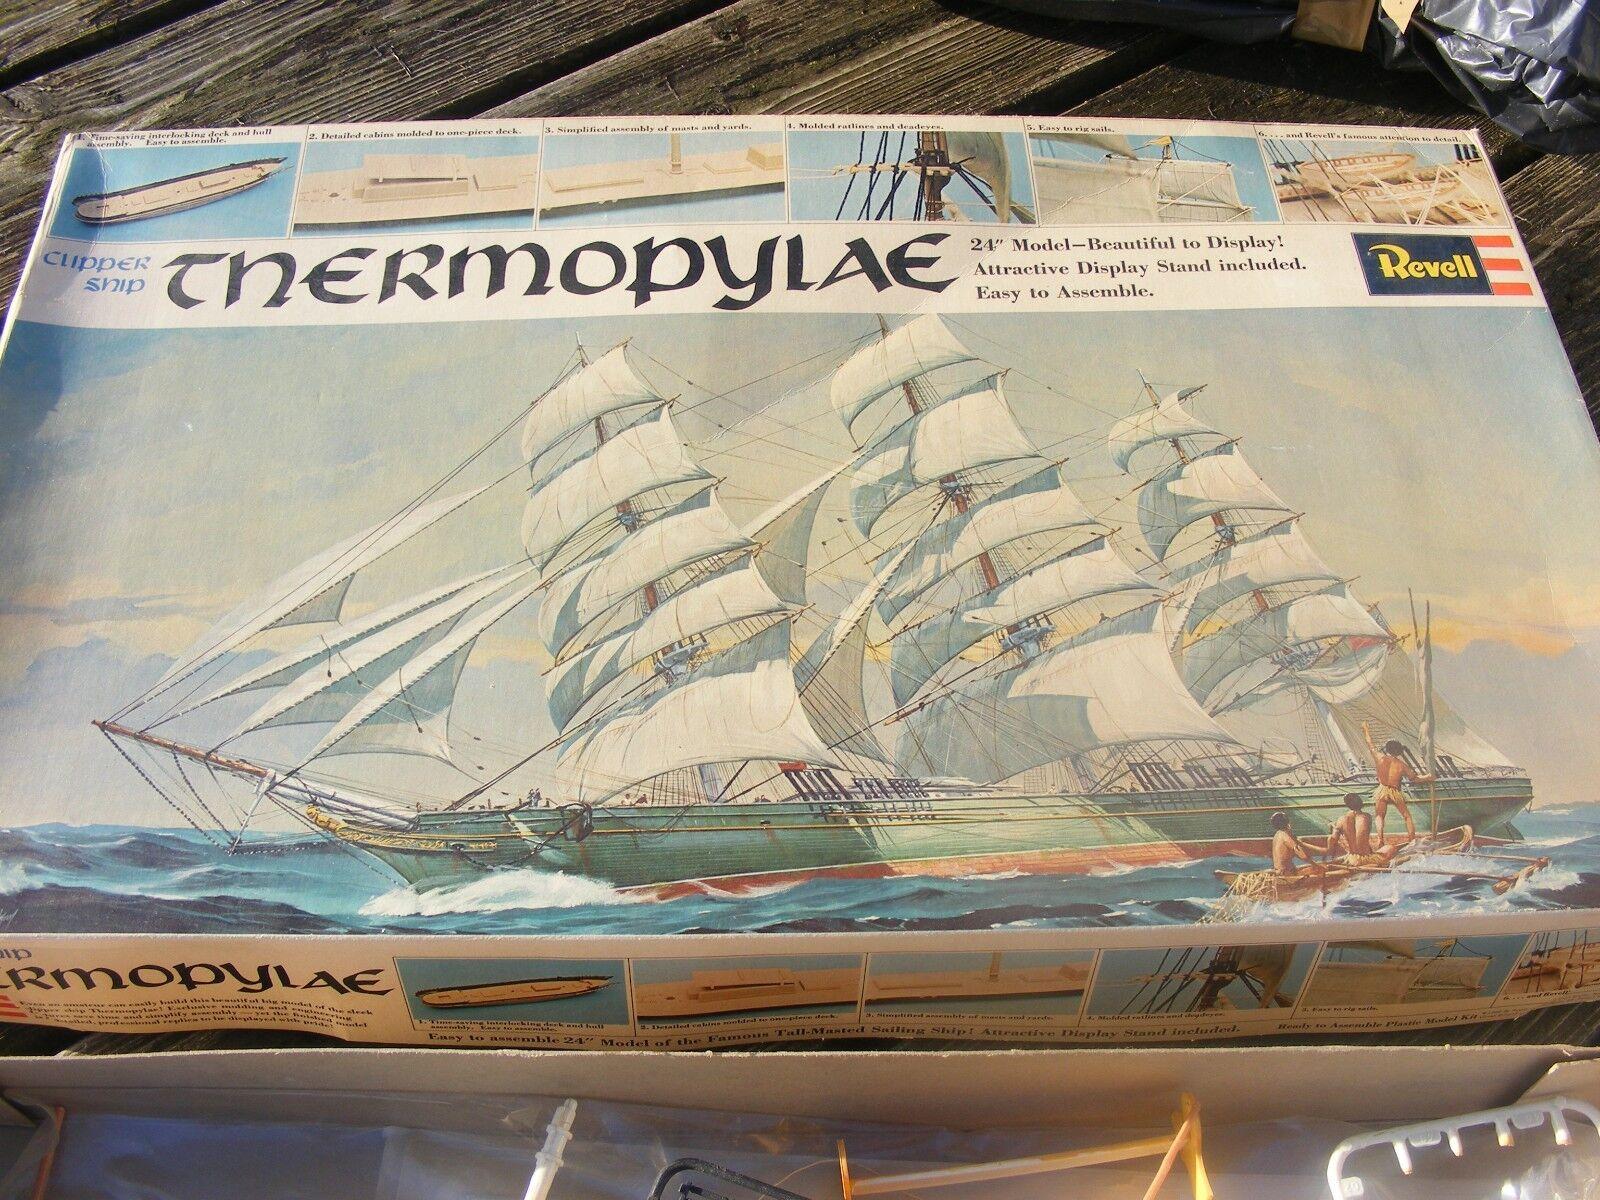 VINTAGE REVELL MODEL KIT THERMODYLAE CLIPPER SHIP